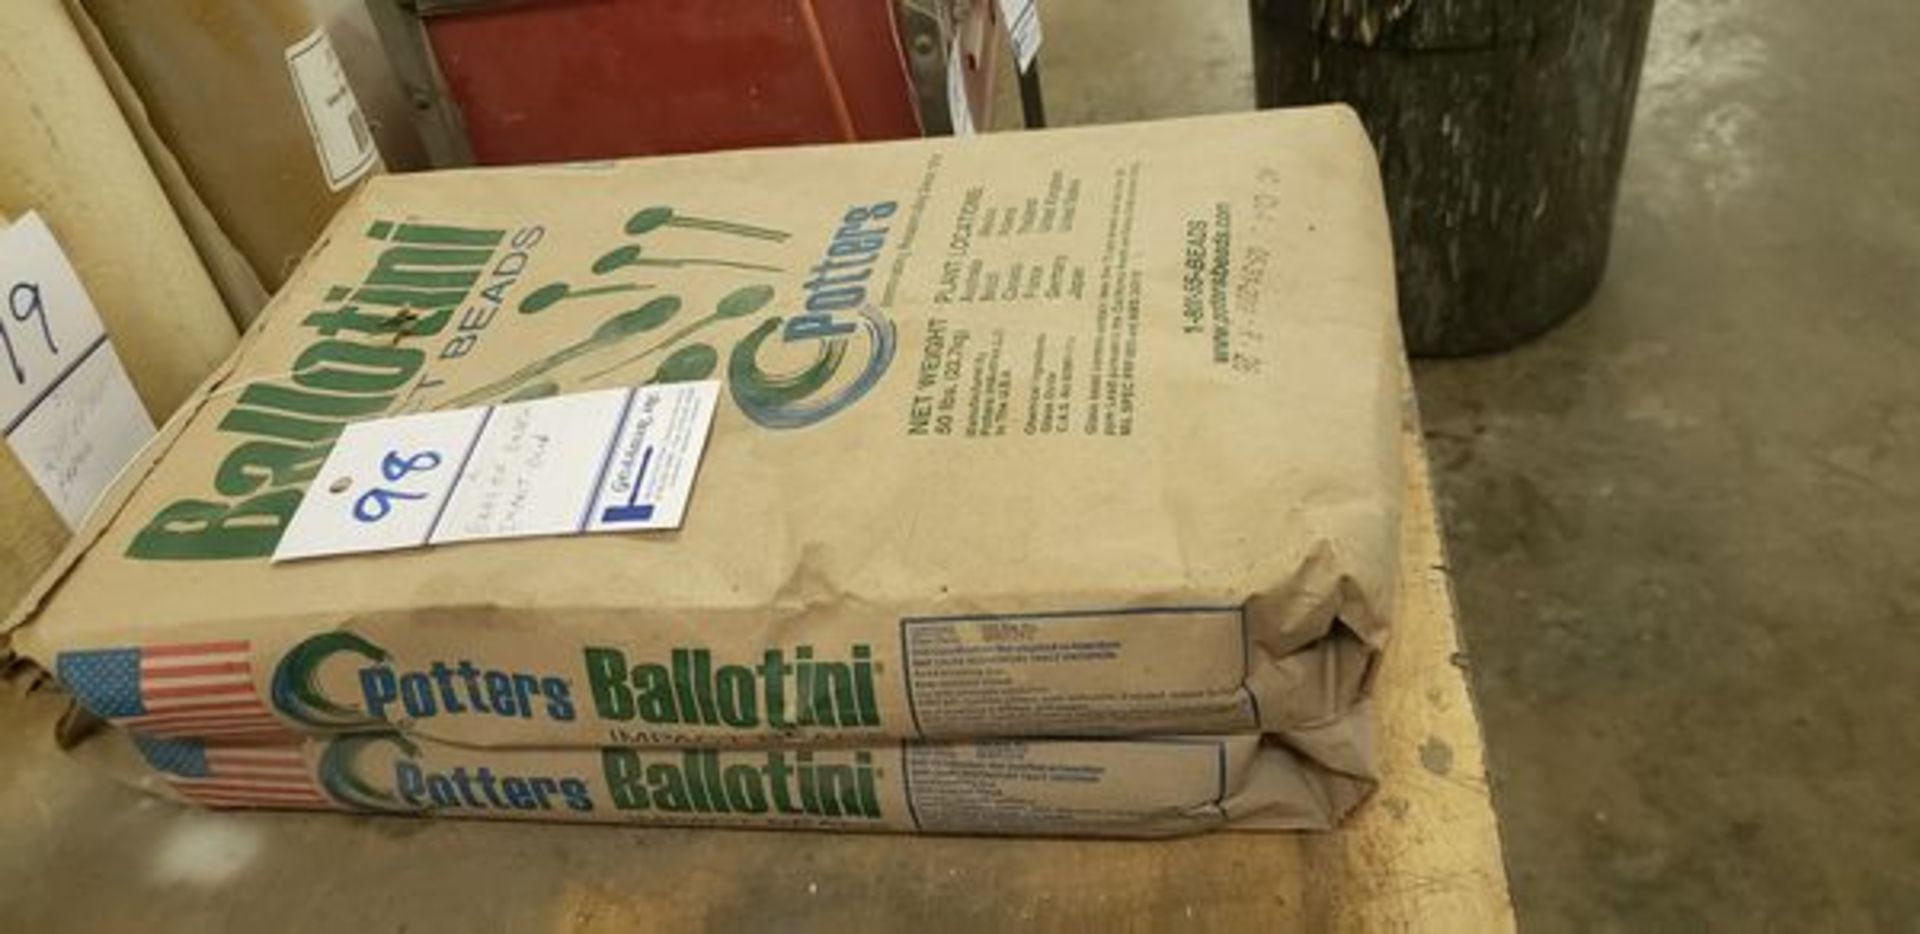 BAGS OF BALLOTINI IMPACT BEAD - Image 2 of 2